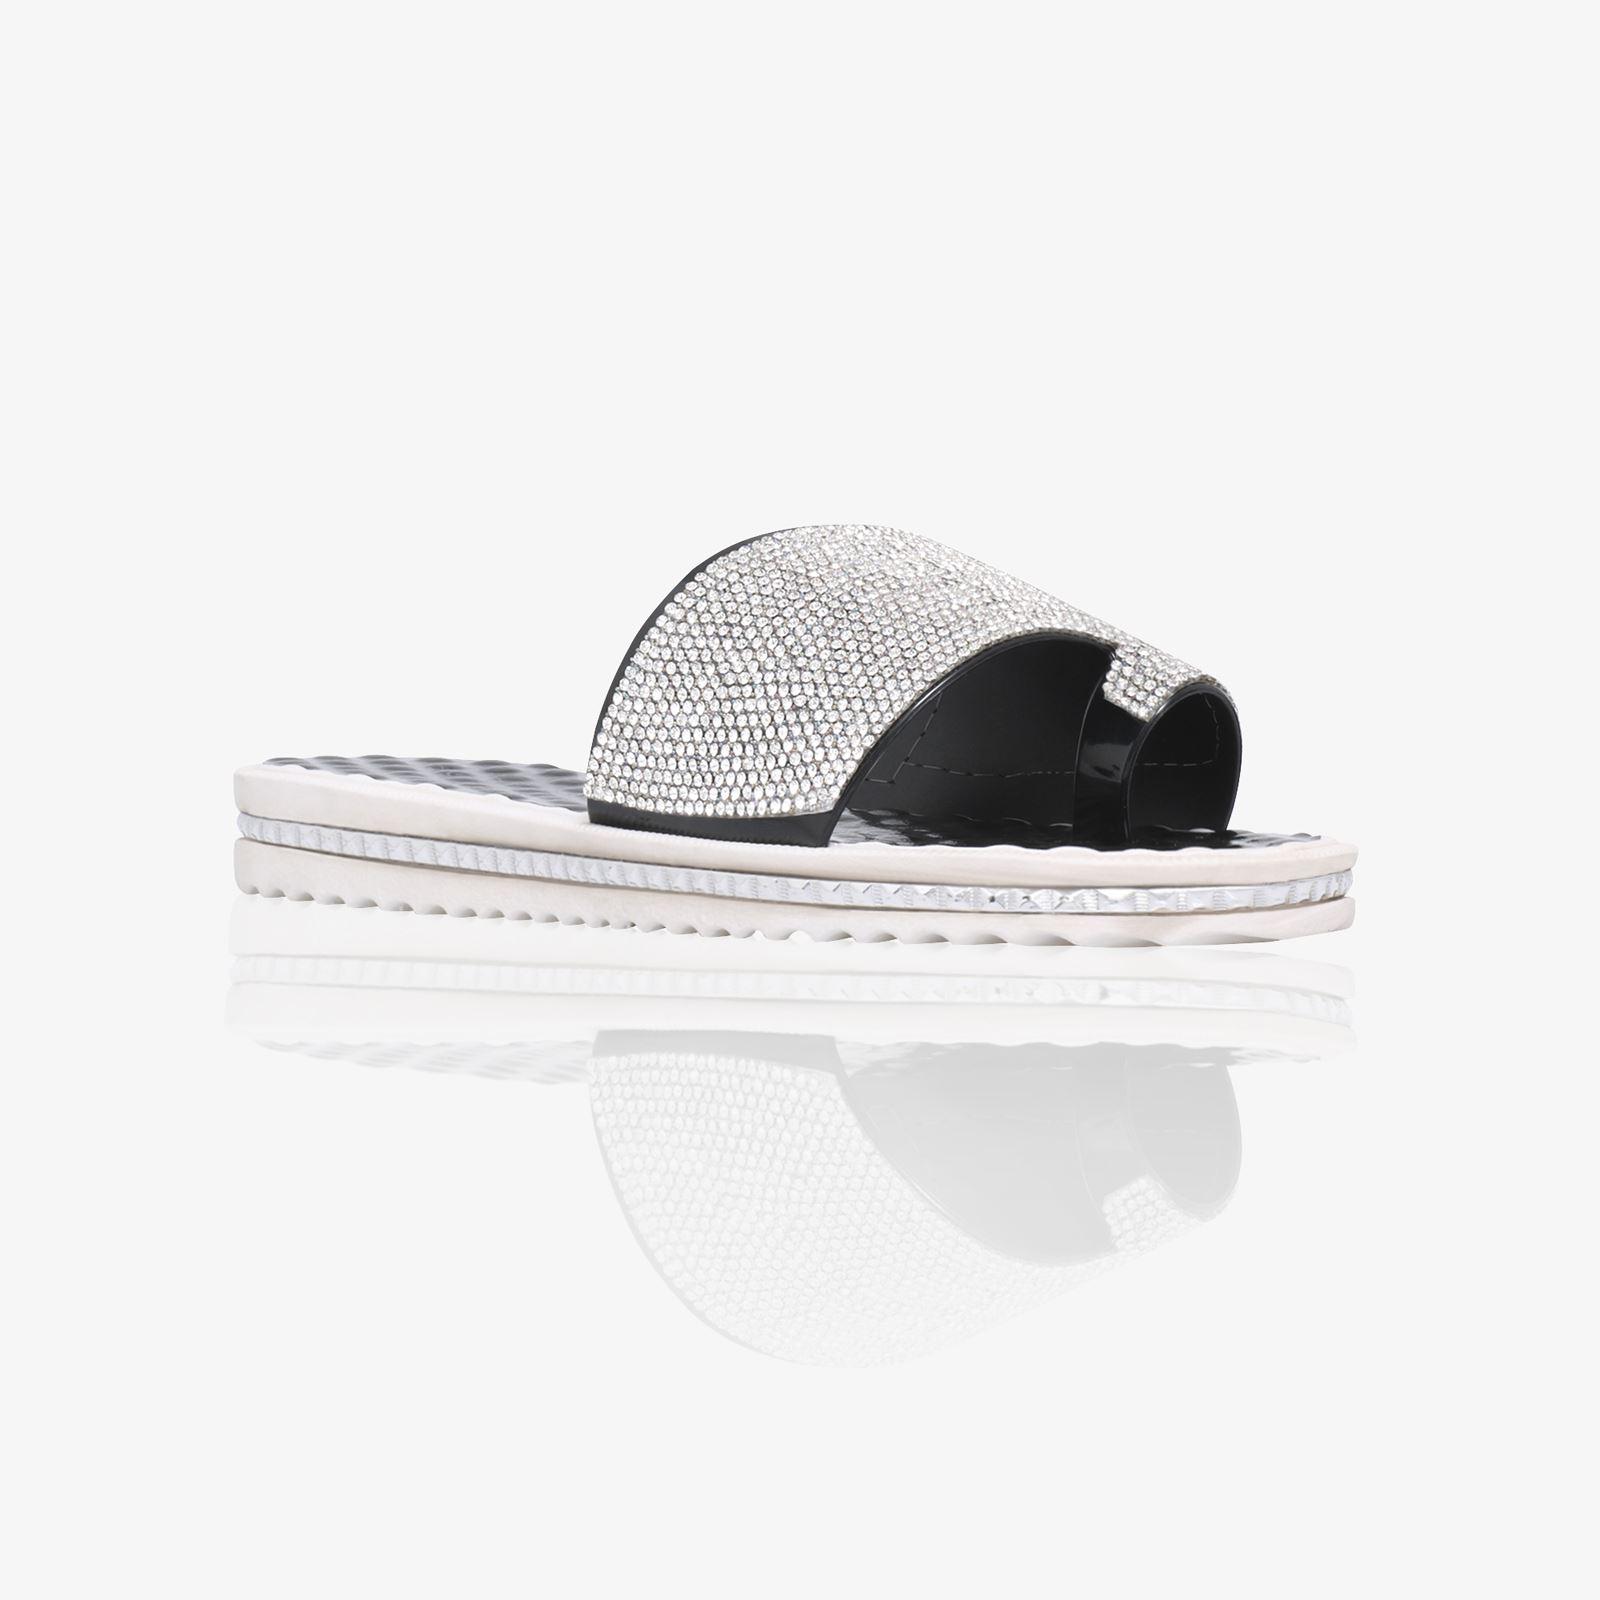 6fa993b50ea0 Women Moulded Jelly Flip Flops Sliders Mules Summer Flat Sandals ...